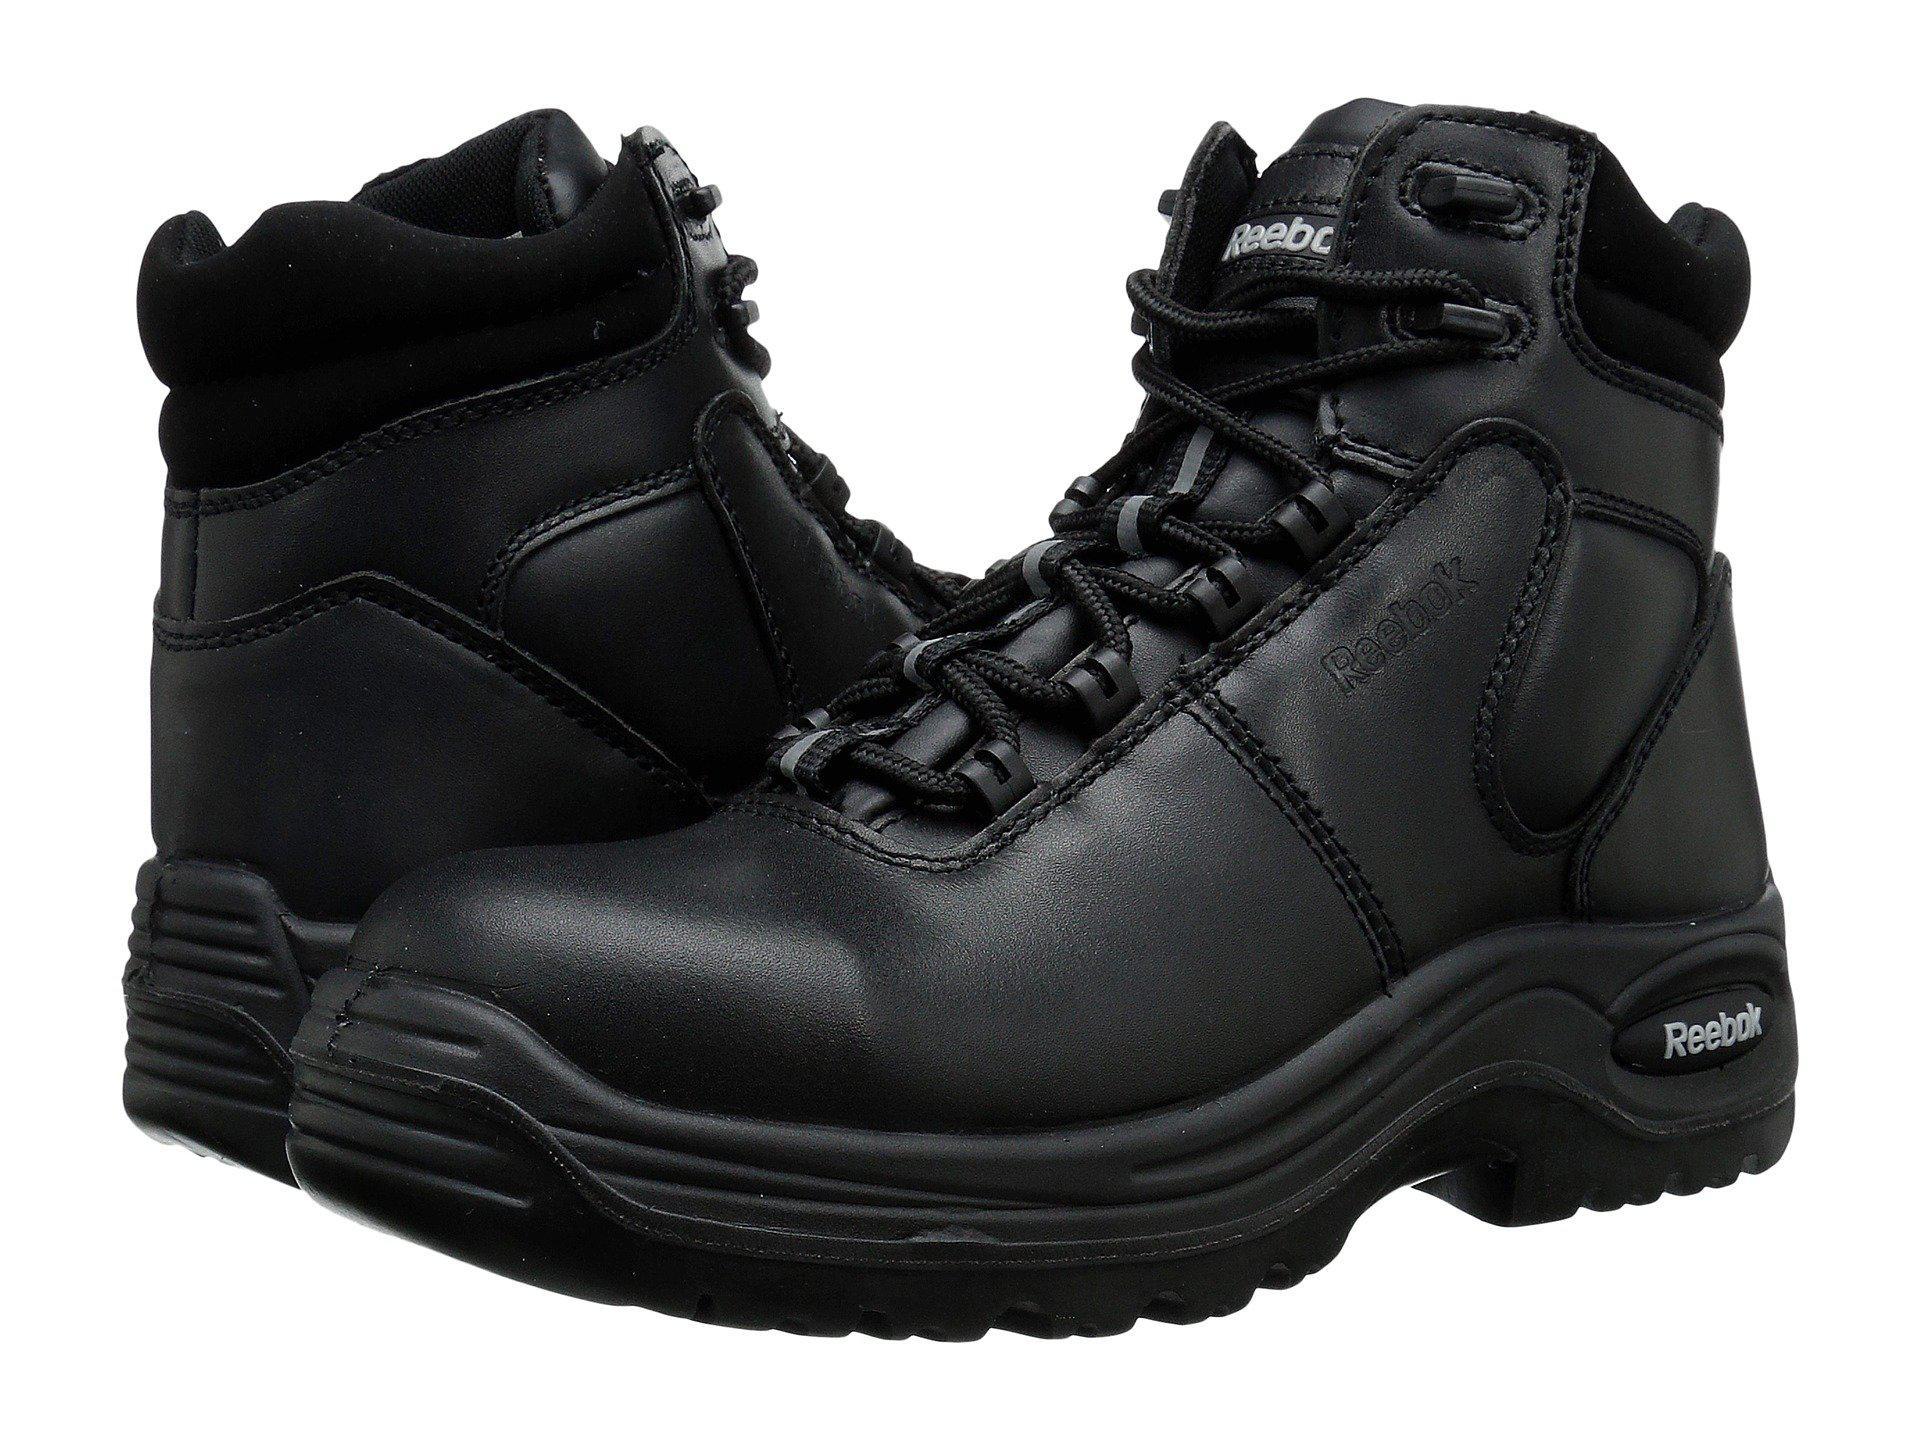 Lyst - Reebok Trainex (black) Men s Boots in Black for Men - Save 24% 3cdec0183